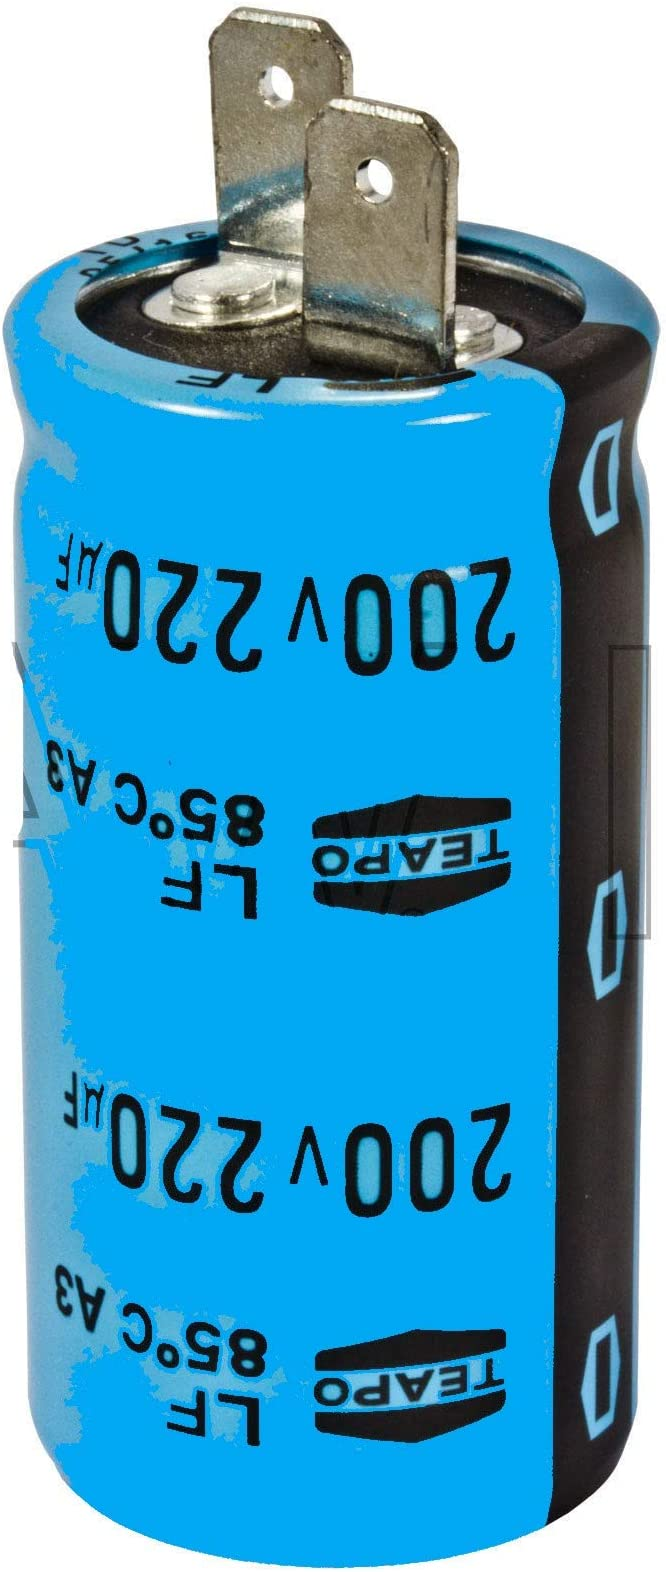 Teapo Electrolytic Capacitor Snap in 220 UF 220uf 400v 85 ° C 22x50mm